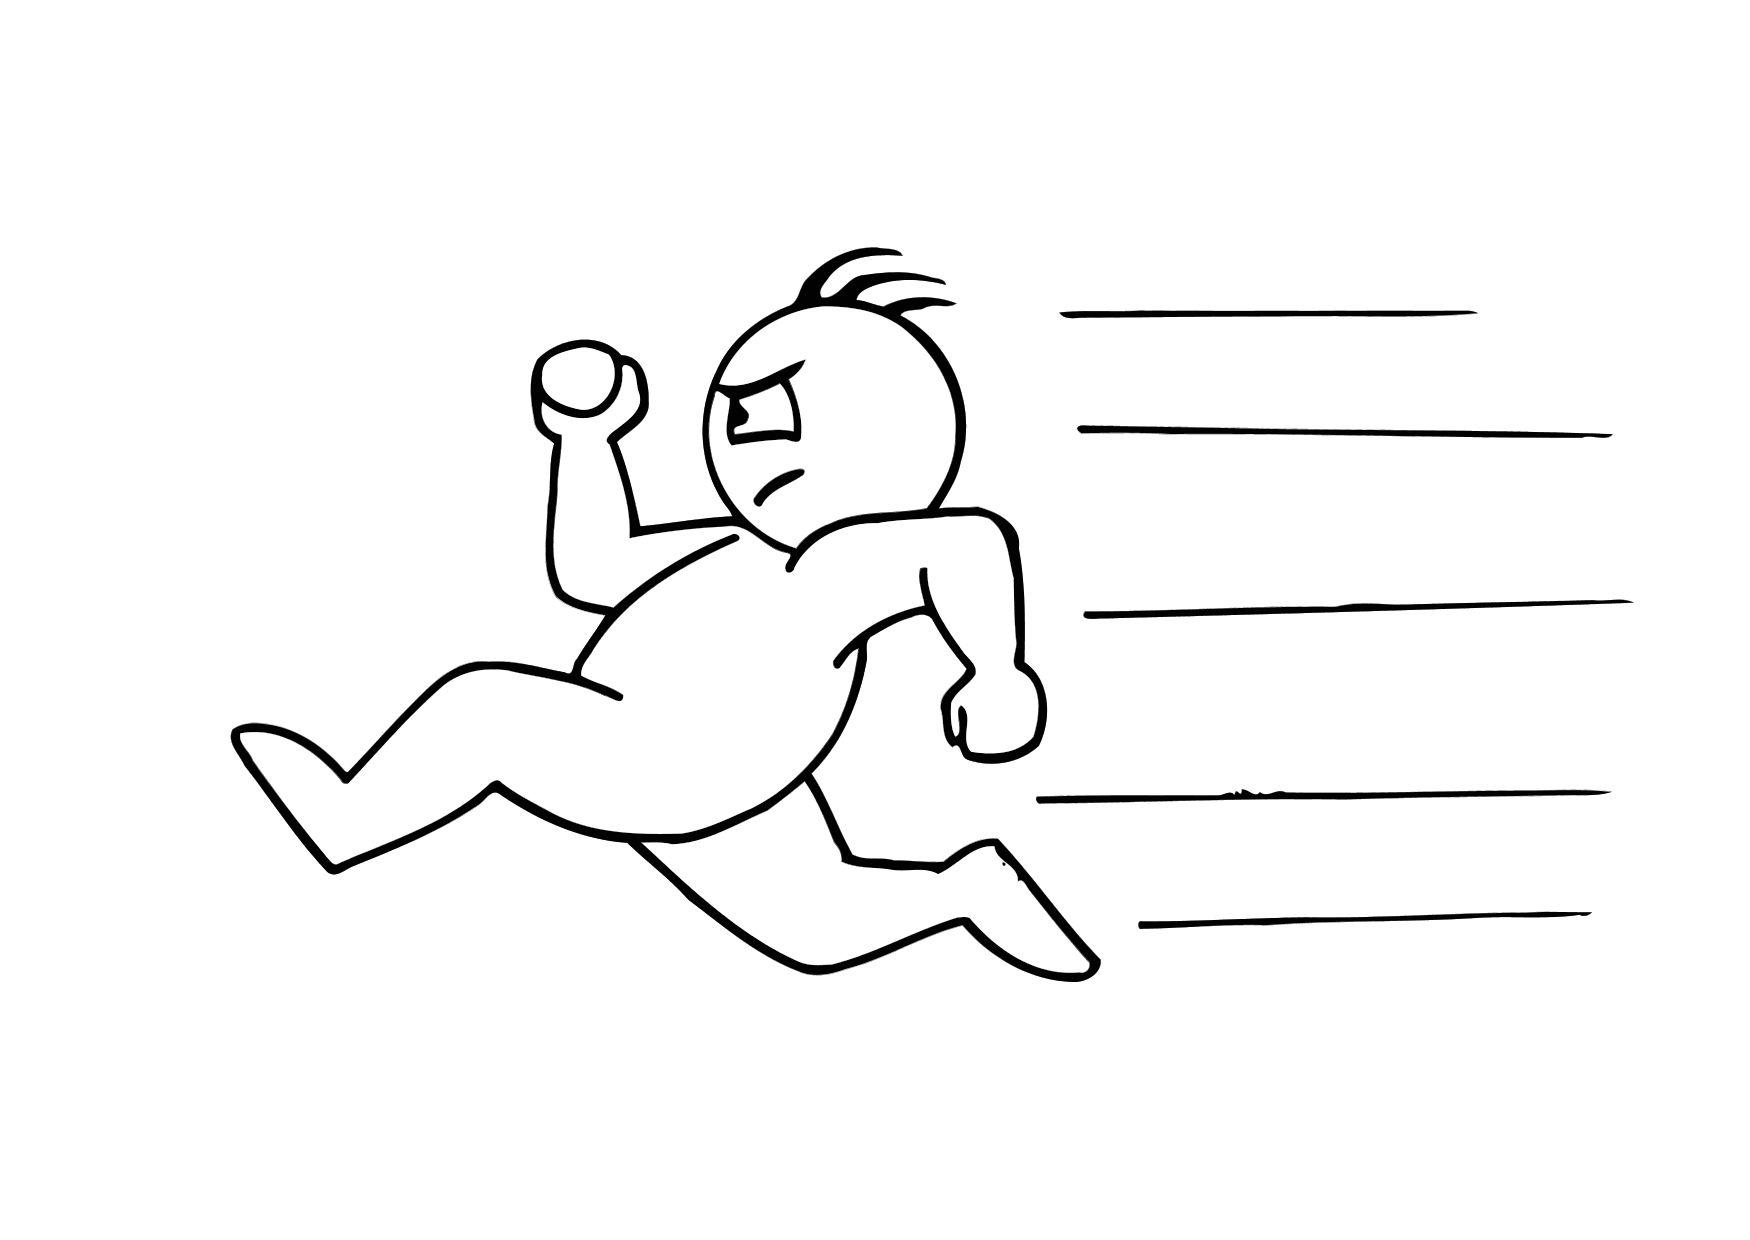 Ik wil rennen